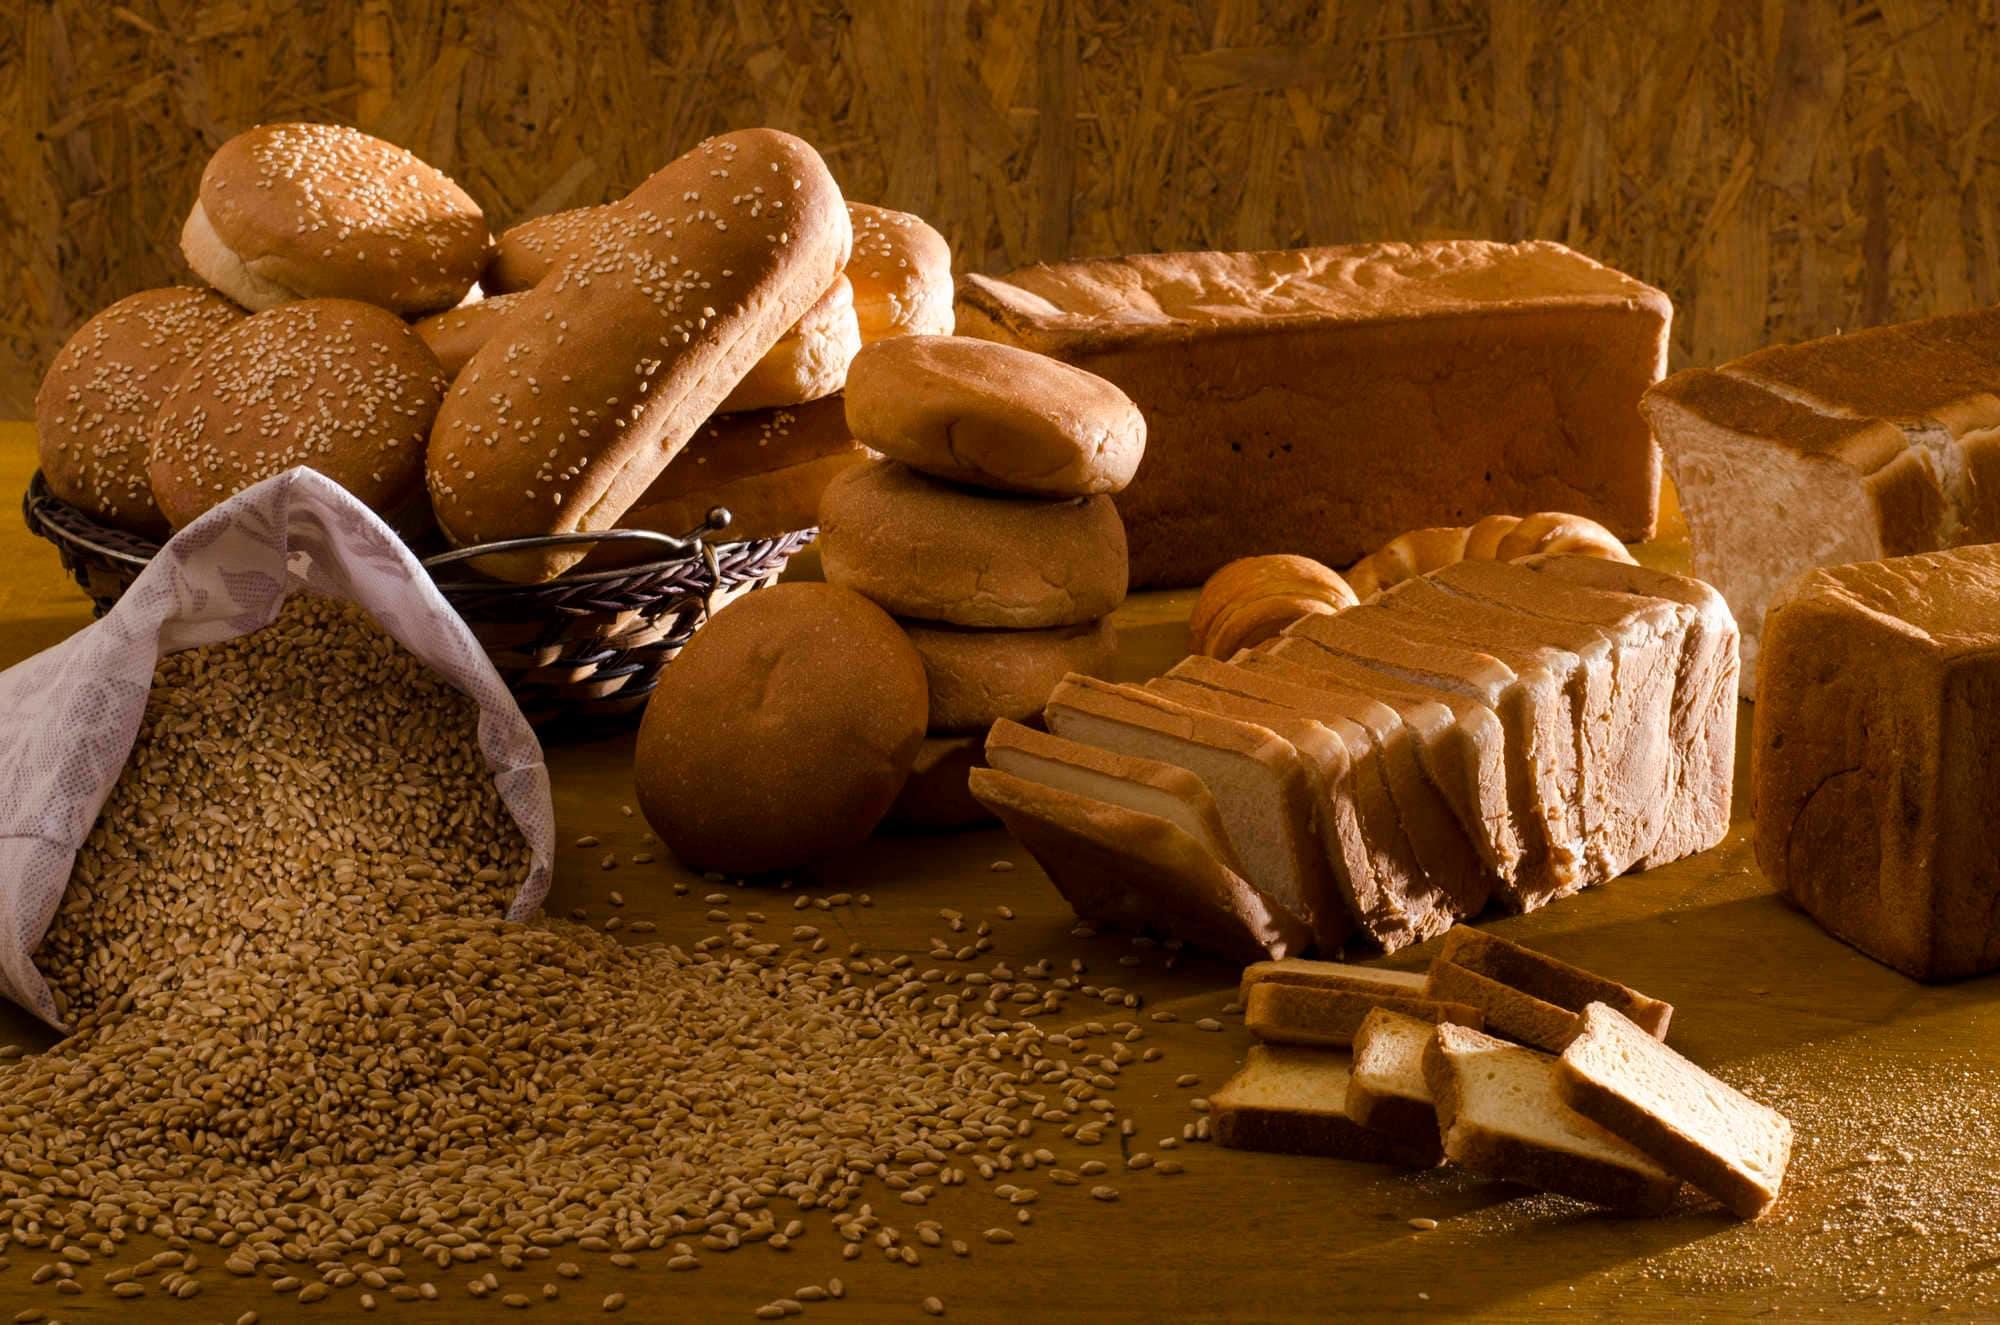 Top 20 Bread Distributors in Chennai - Justdial